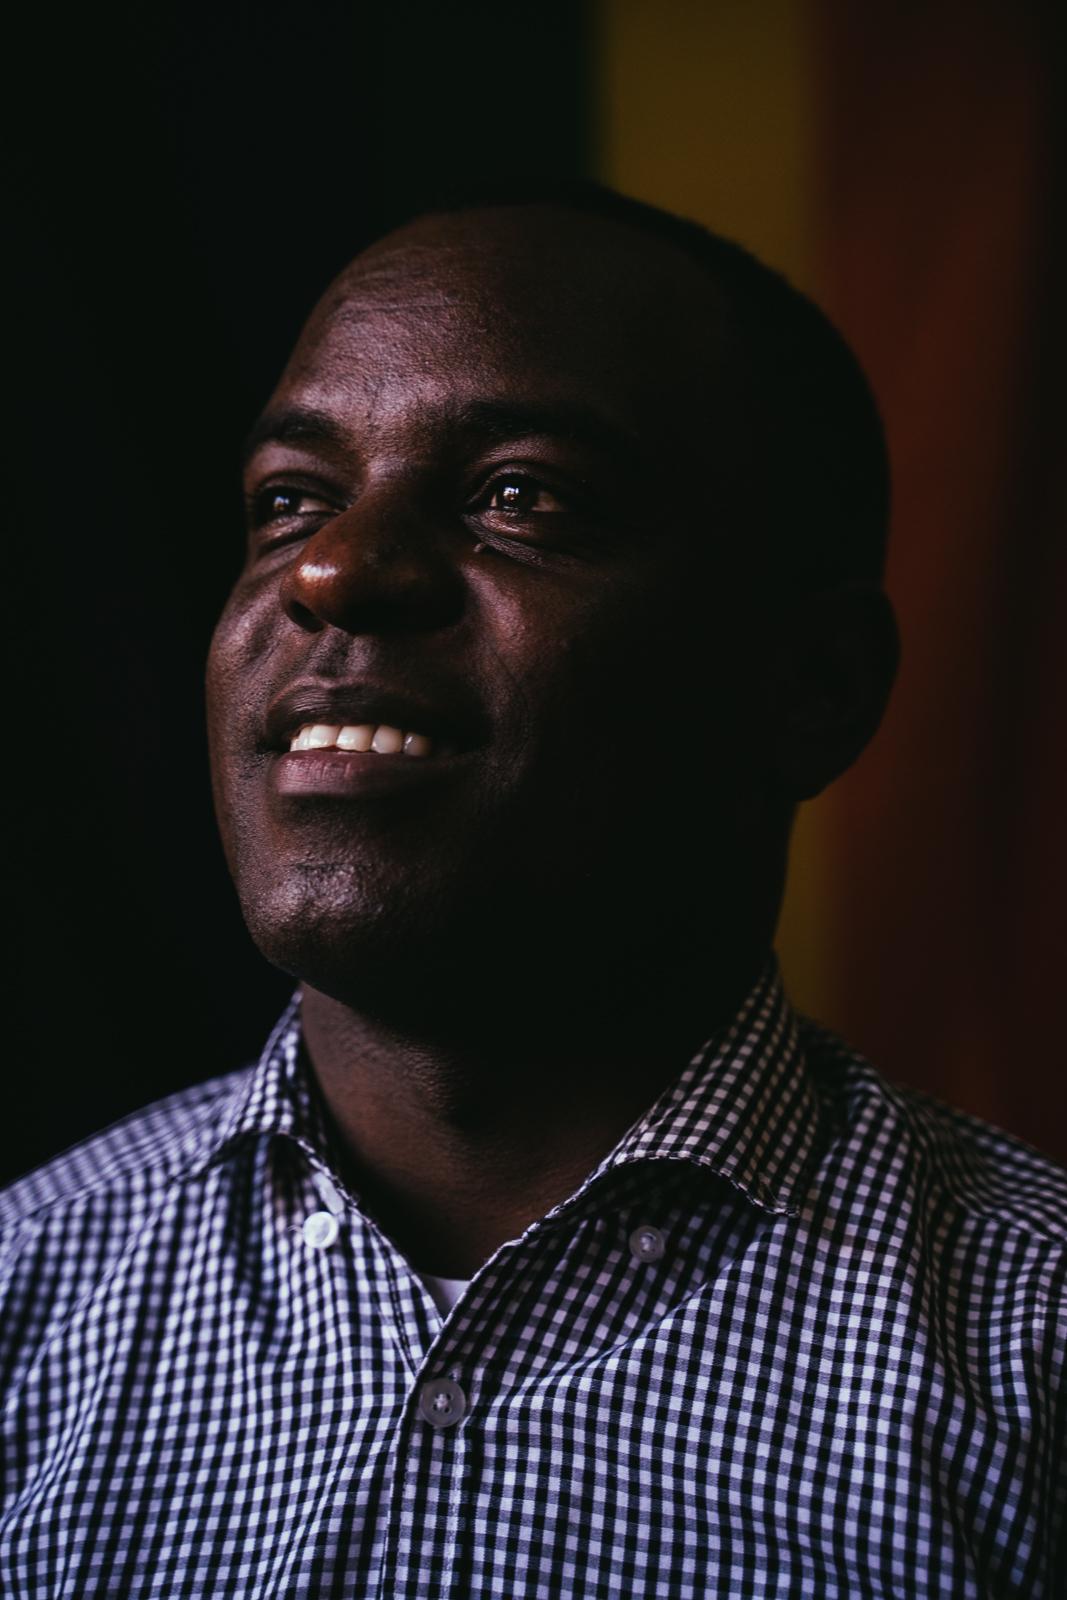 Queer_RebeccaRuetten_Uganda_Frank_web-08544.jpg